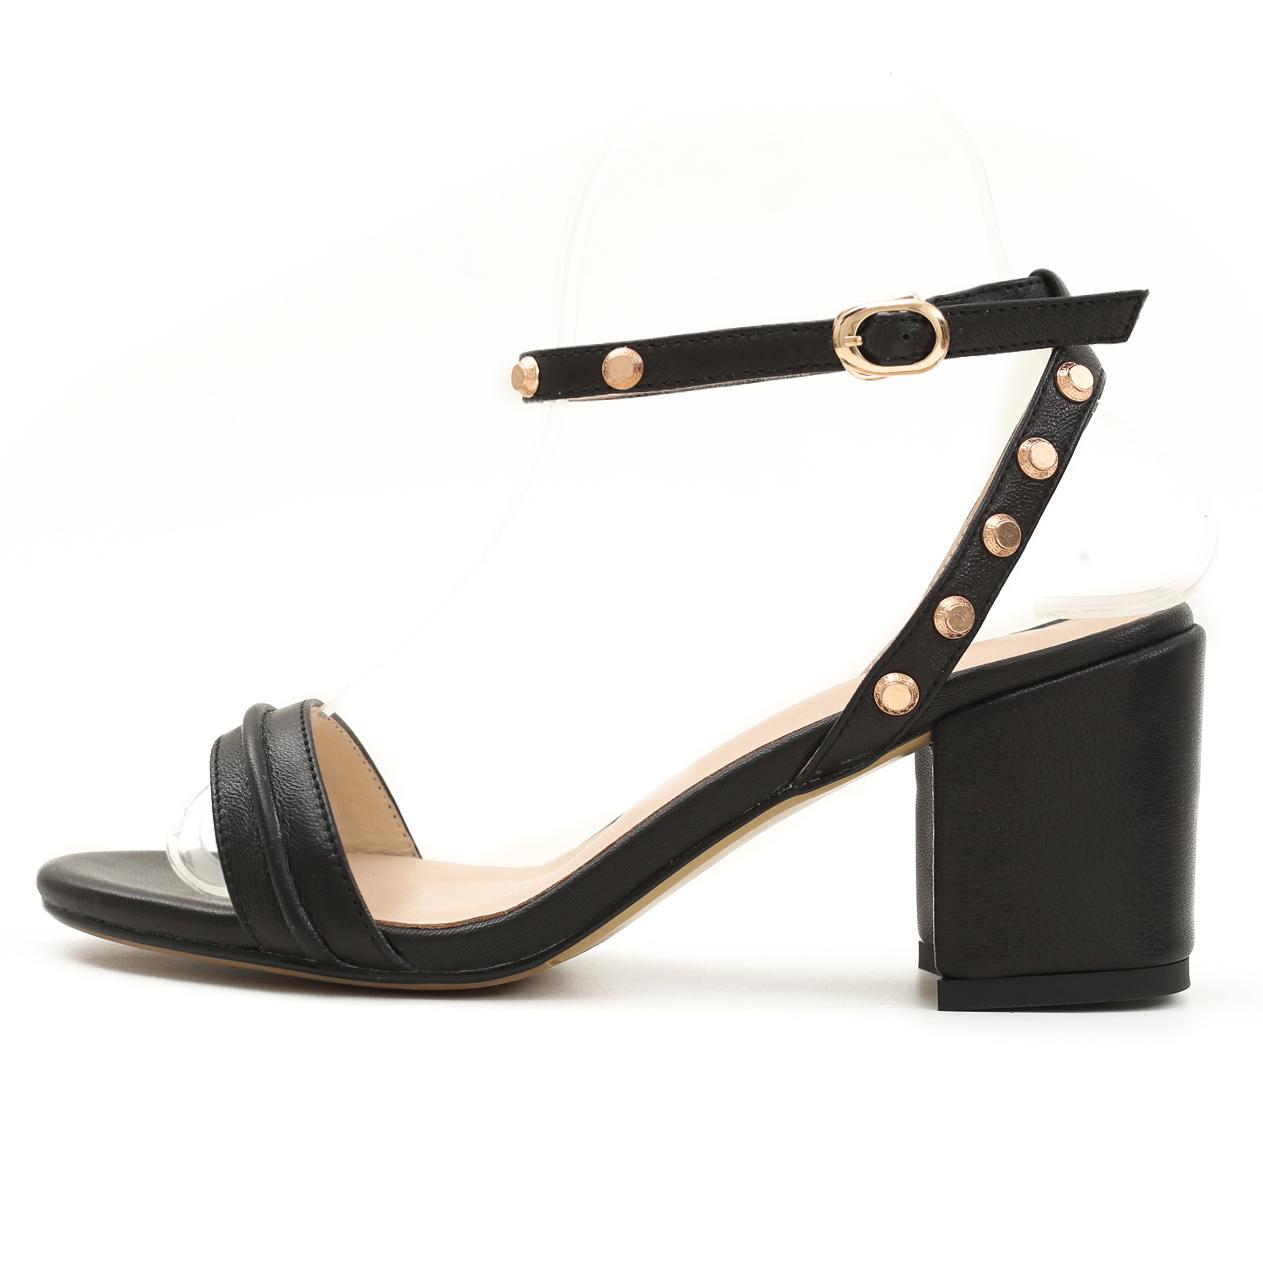 9fc6b847e92 US  47 - 2018 summer high heels open toe women s shoes genuine leather  chunky heels ankle strap sandals - www.ardenfurtado.com